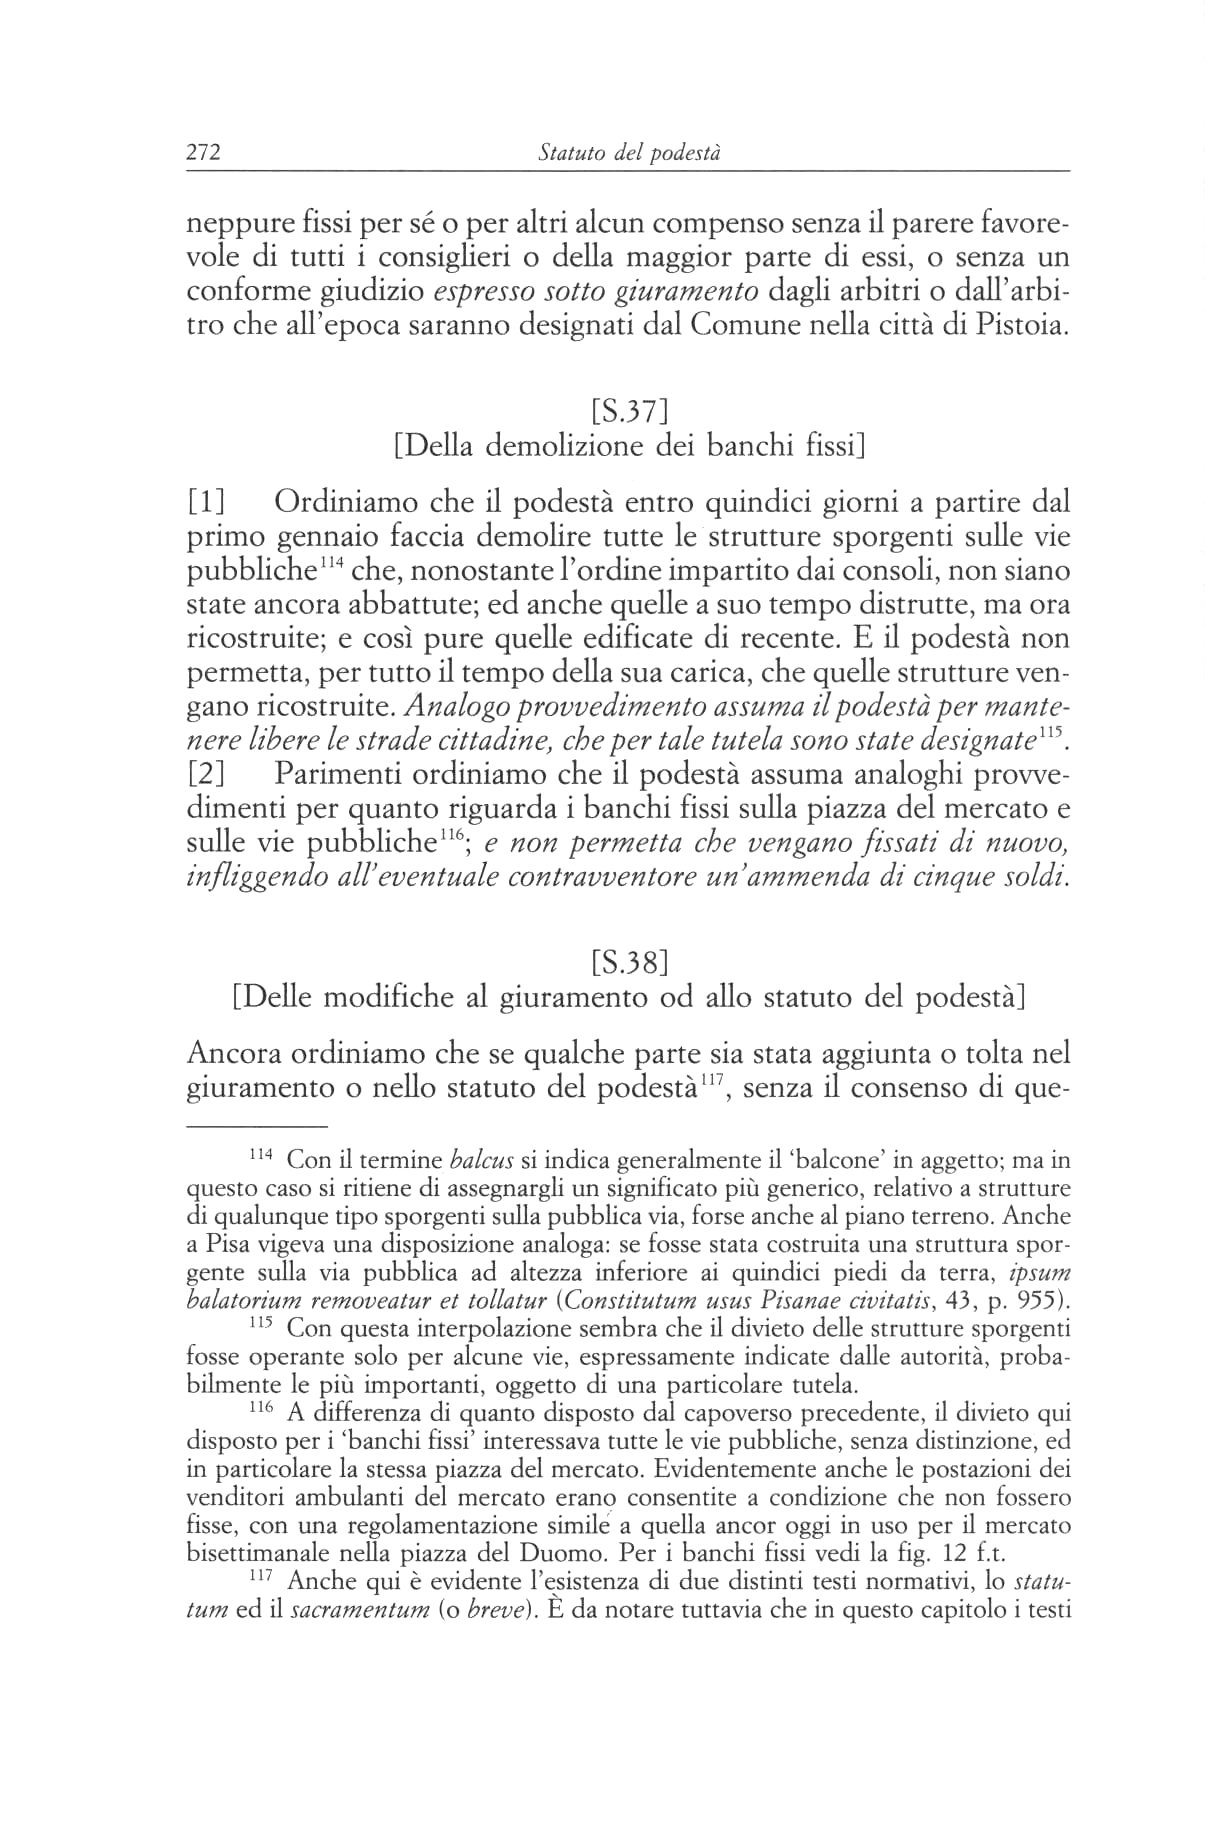 statuti pistoiesi del sec.XII 0272.jpg